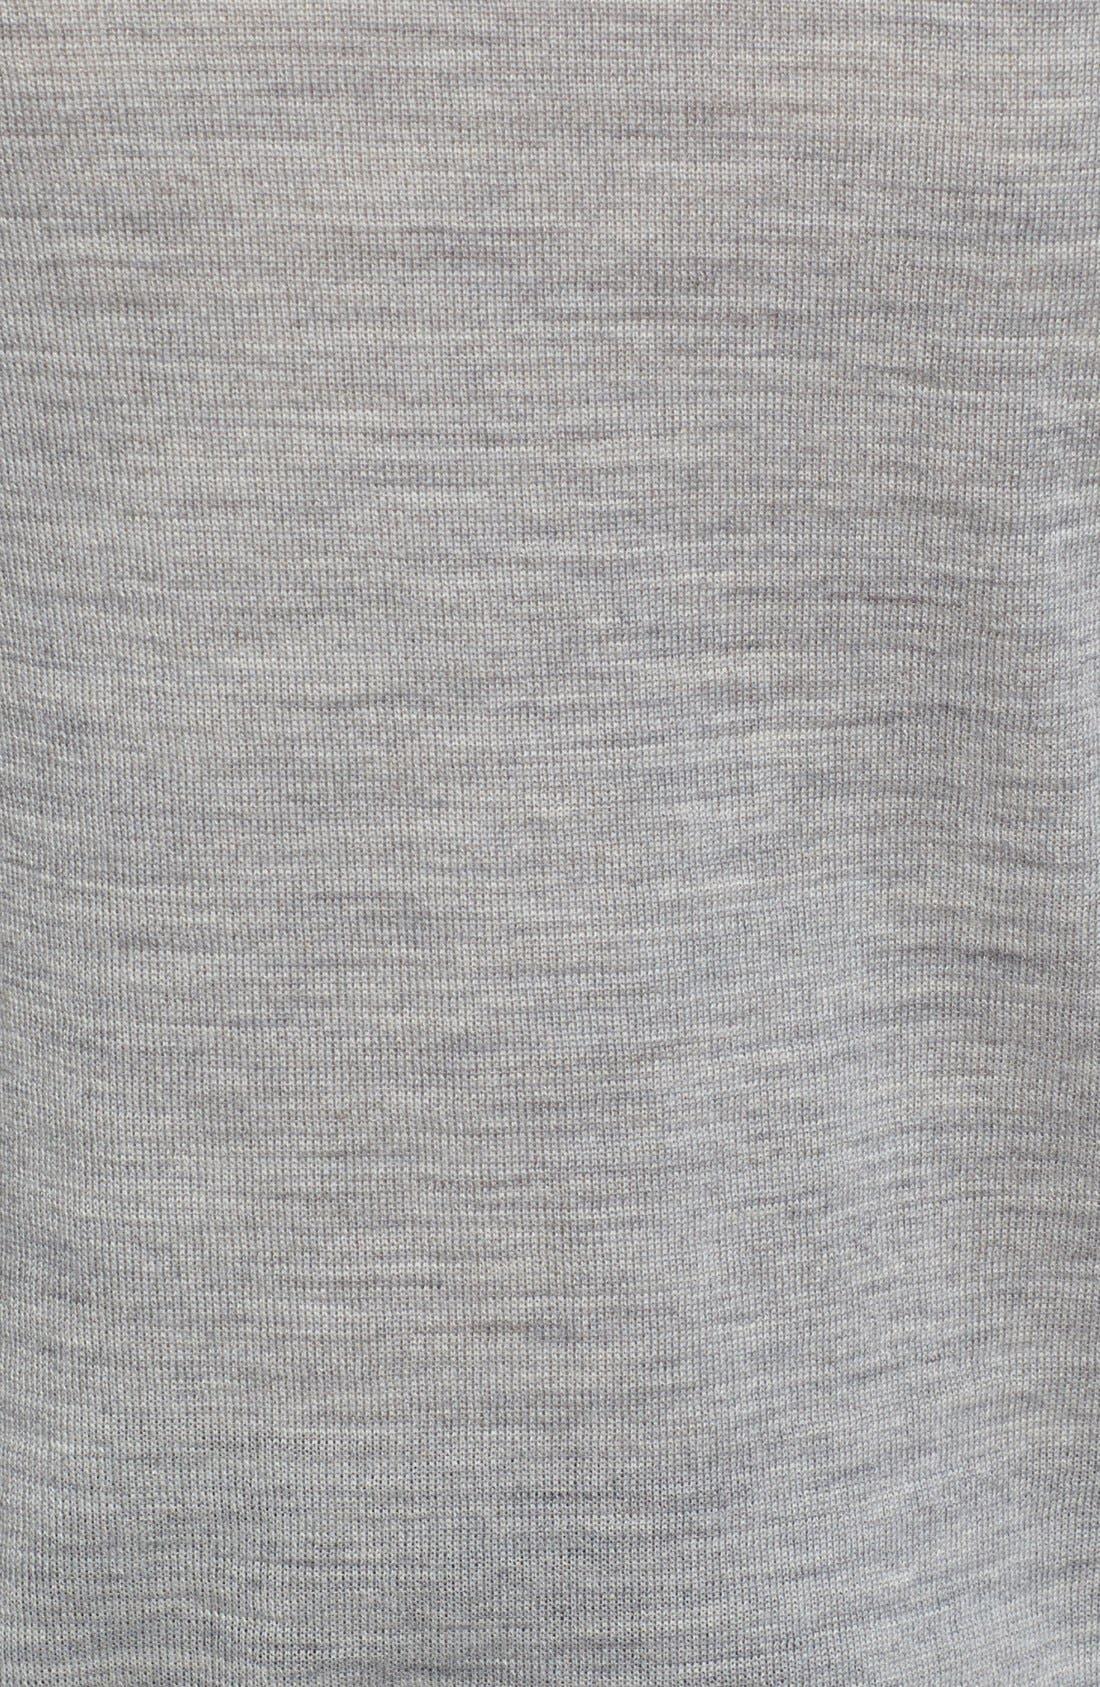 Alternate Image 3  - Comme des Garçons Crewneck Wool Pullover